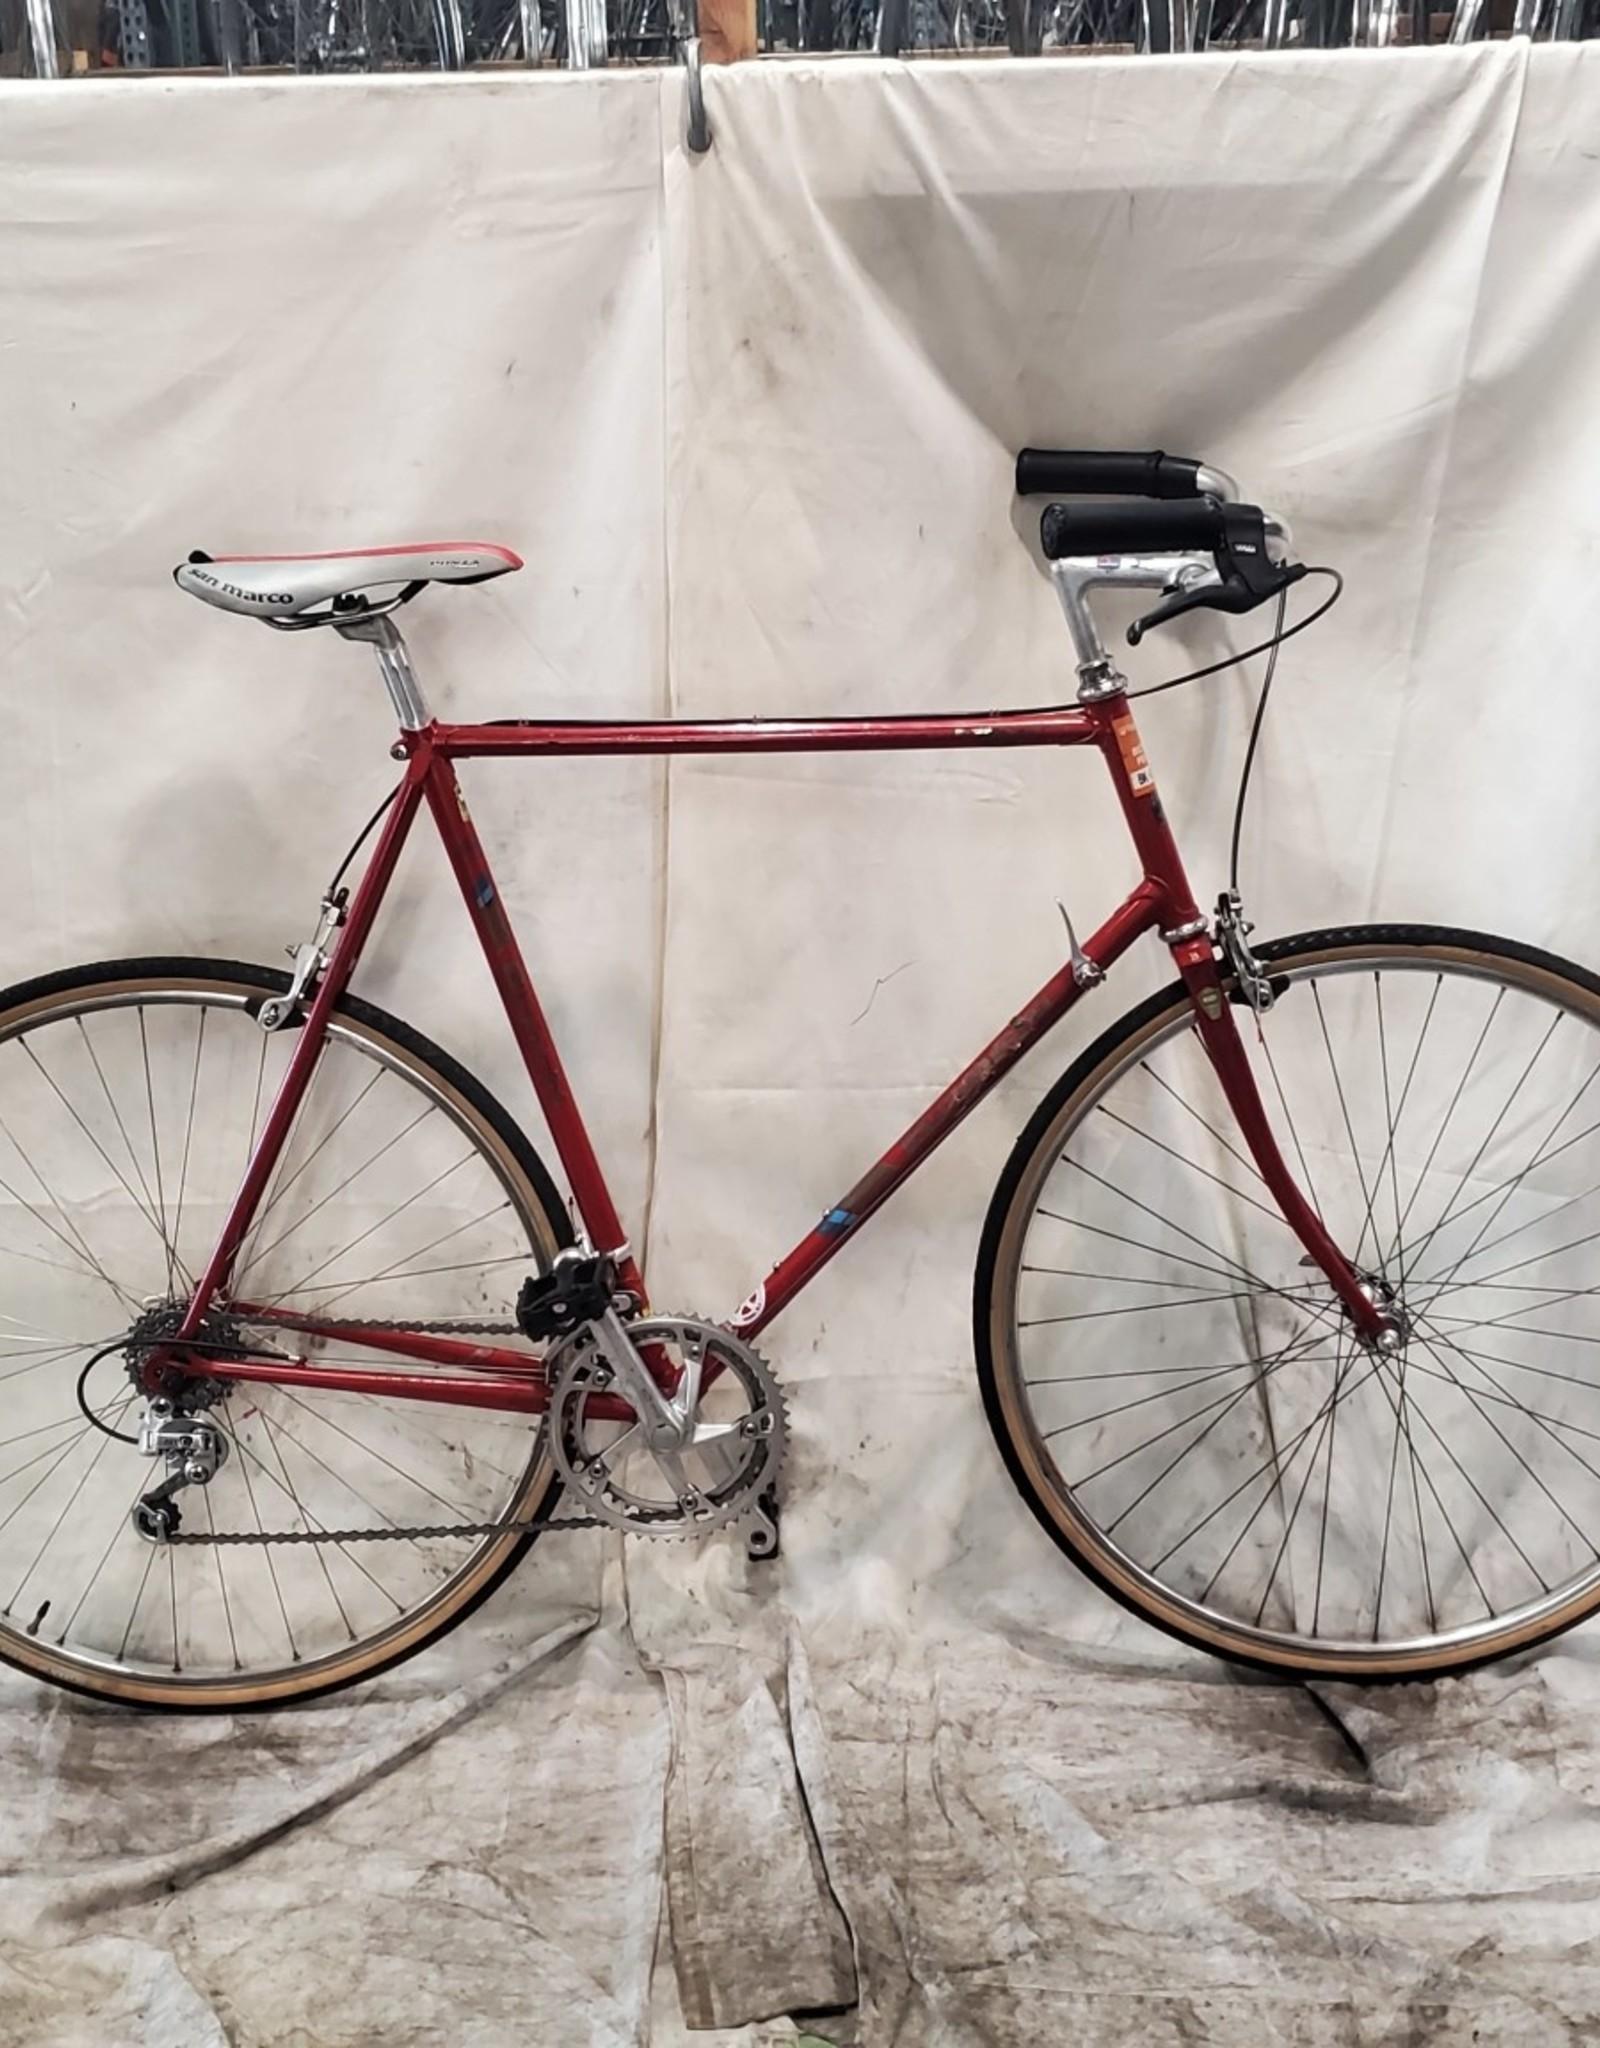 62cm Bianchi Special (9259 SFR)